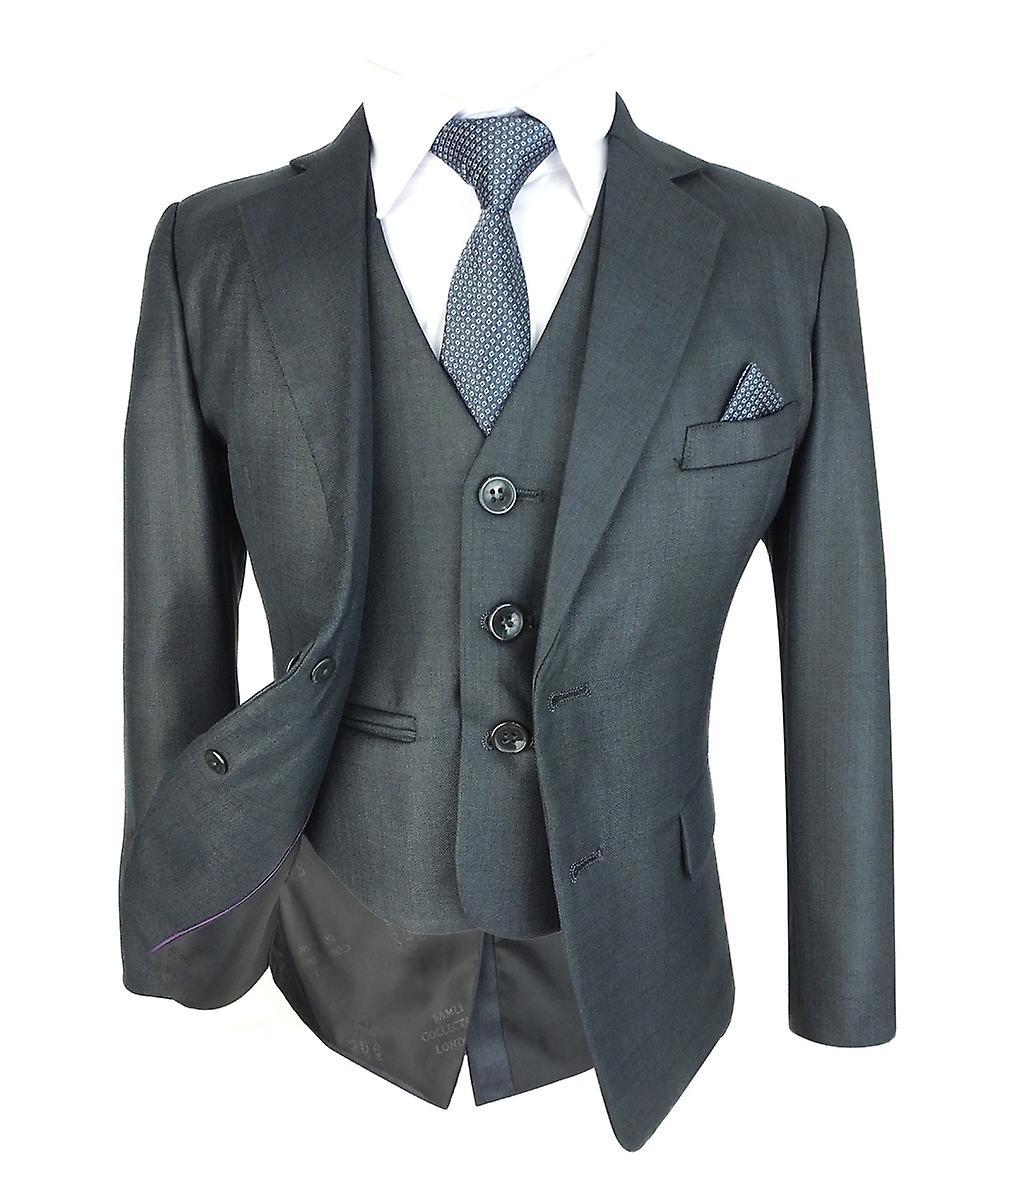 garçons Slim fit Dark gris Complete Suit Set